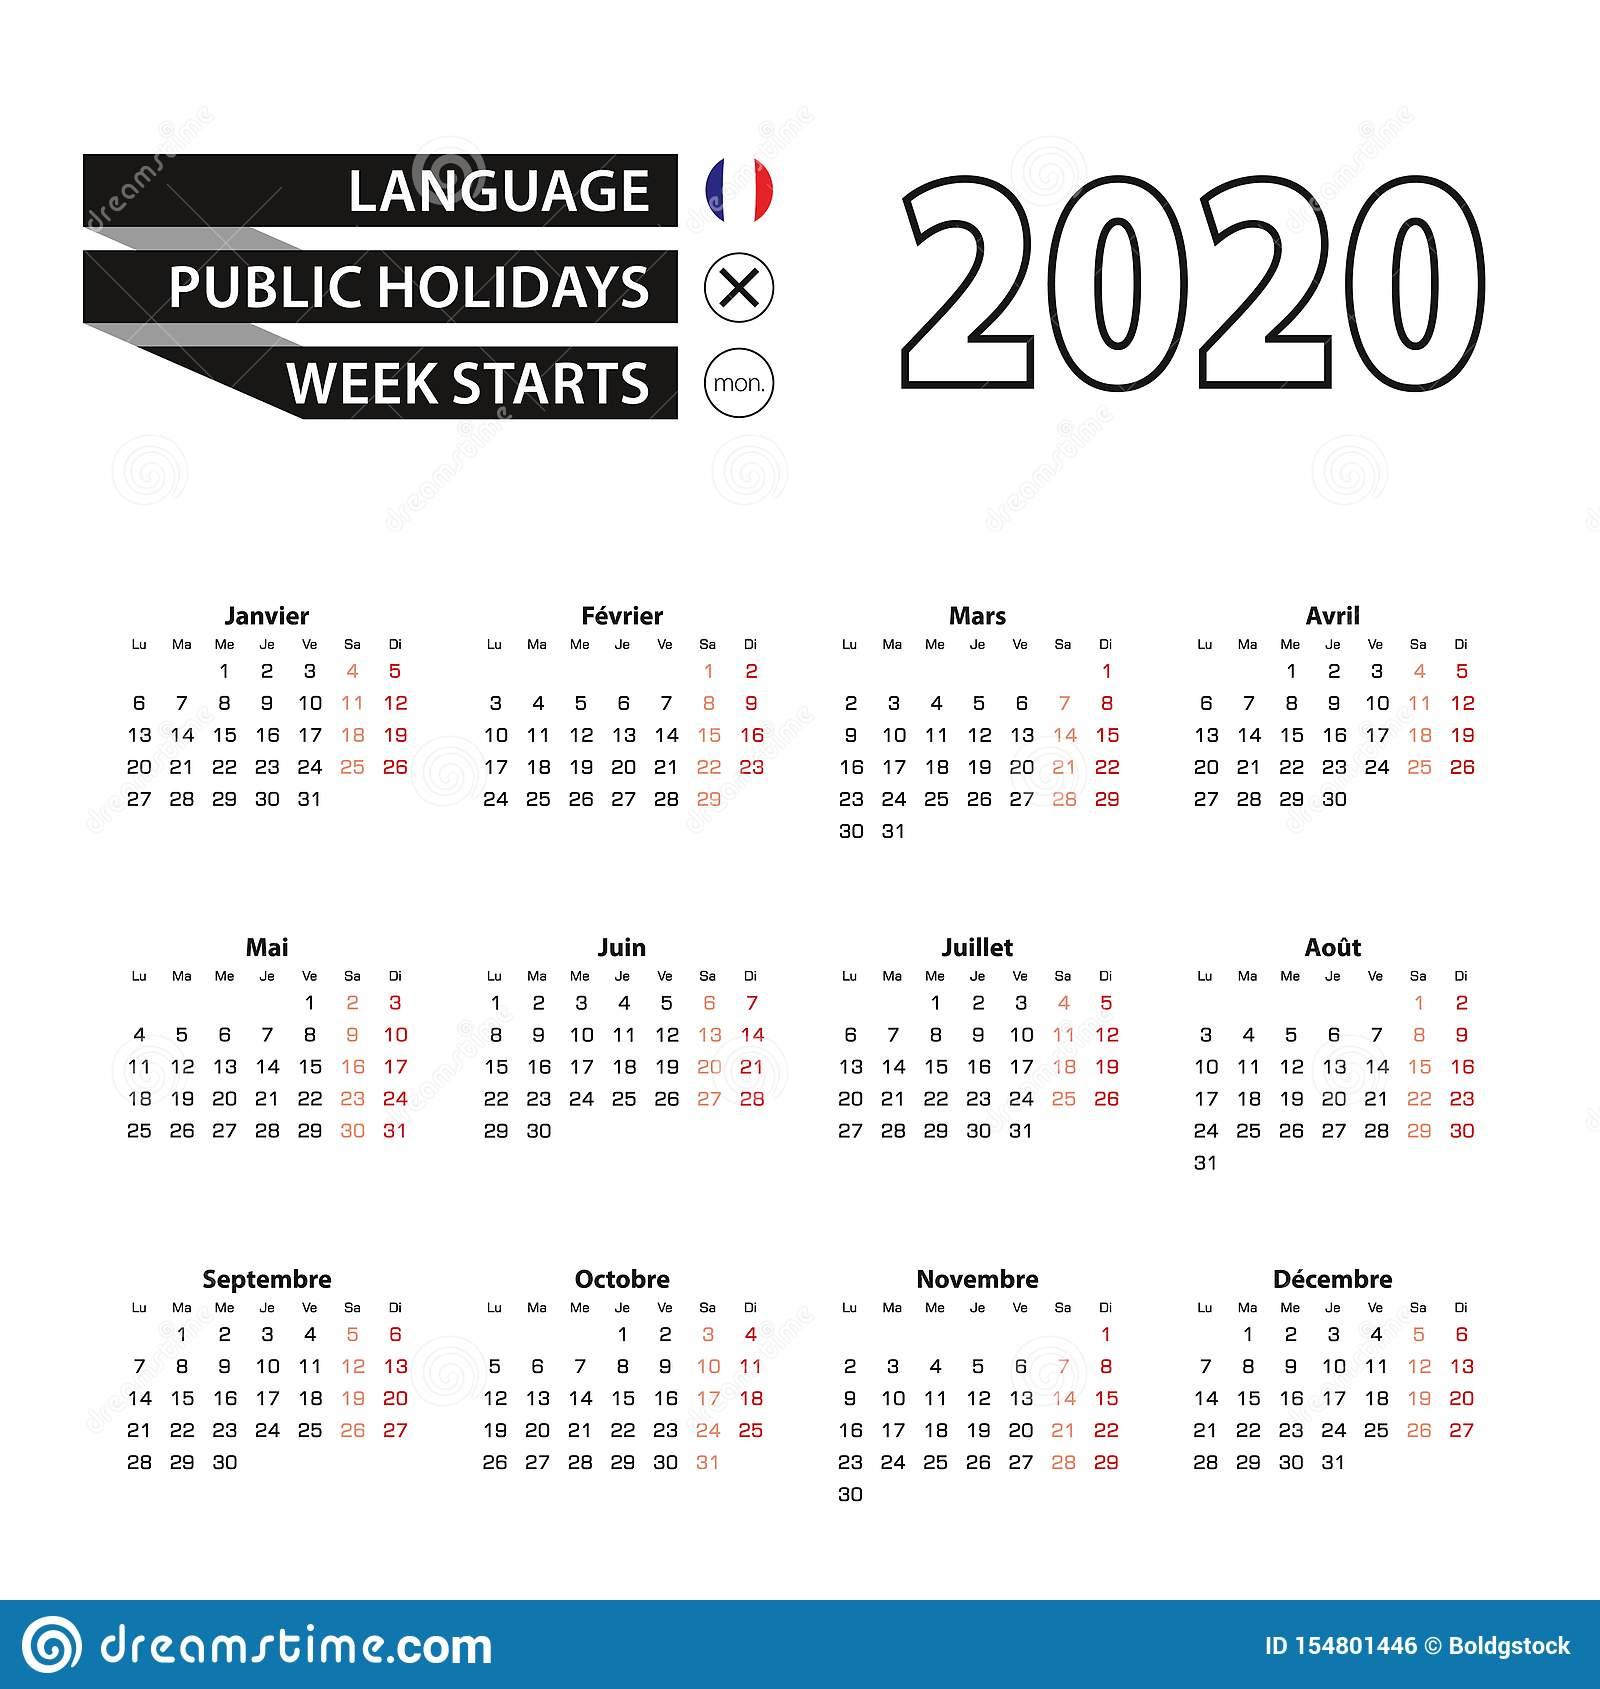 Calendar 2020 In French Language, Week Starts On Monday